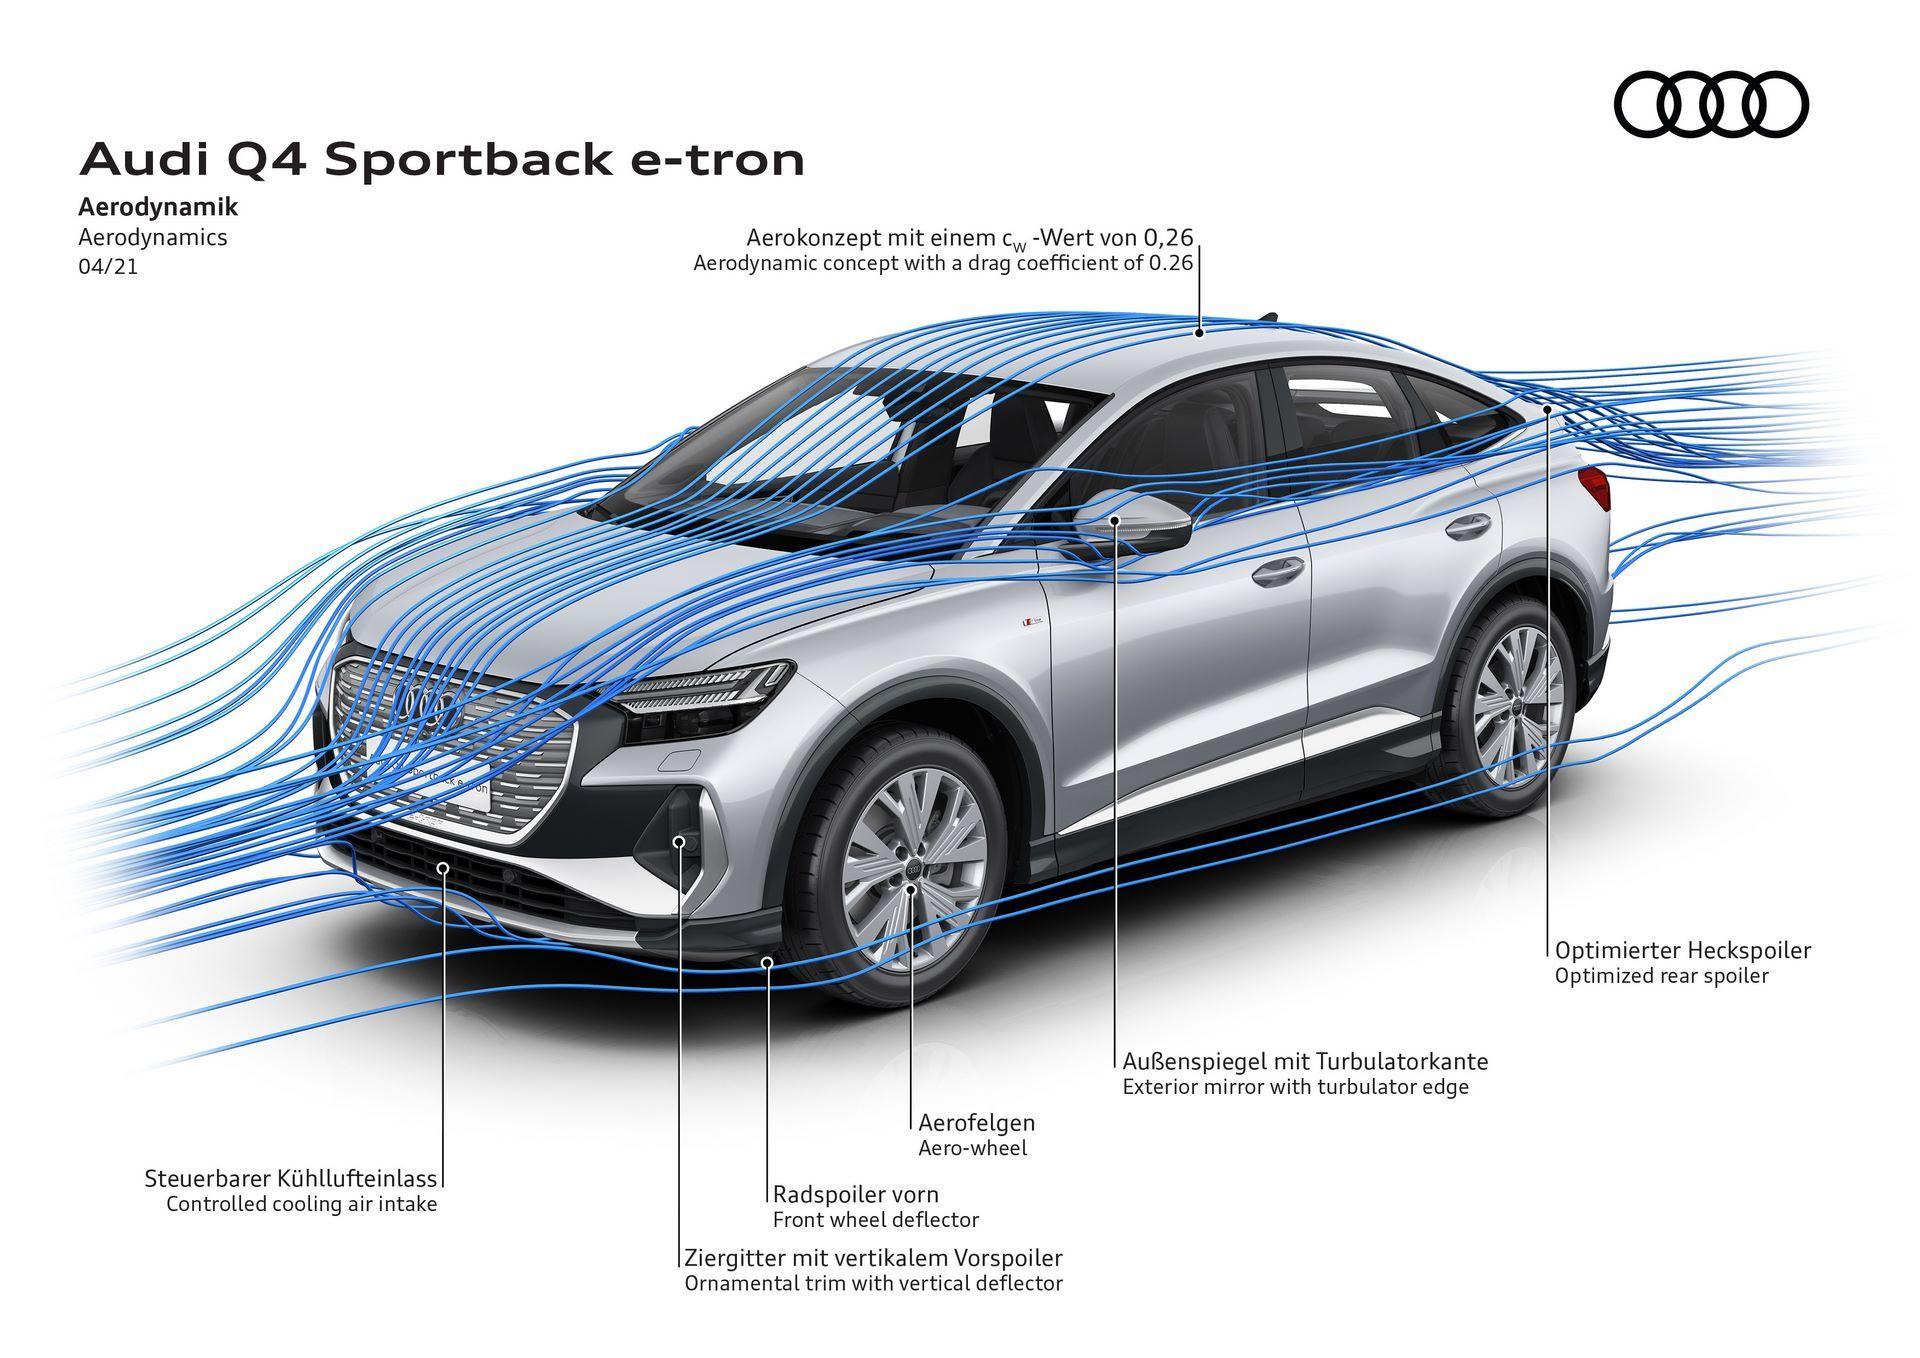 Audi-Q4-e-tron-and-Q4-e-tron-Sportback-157